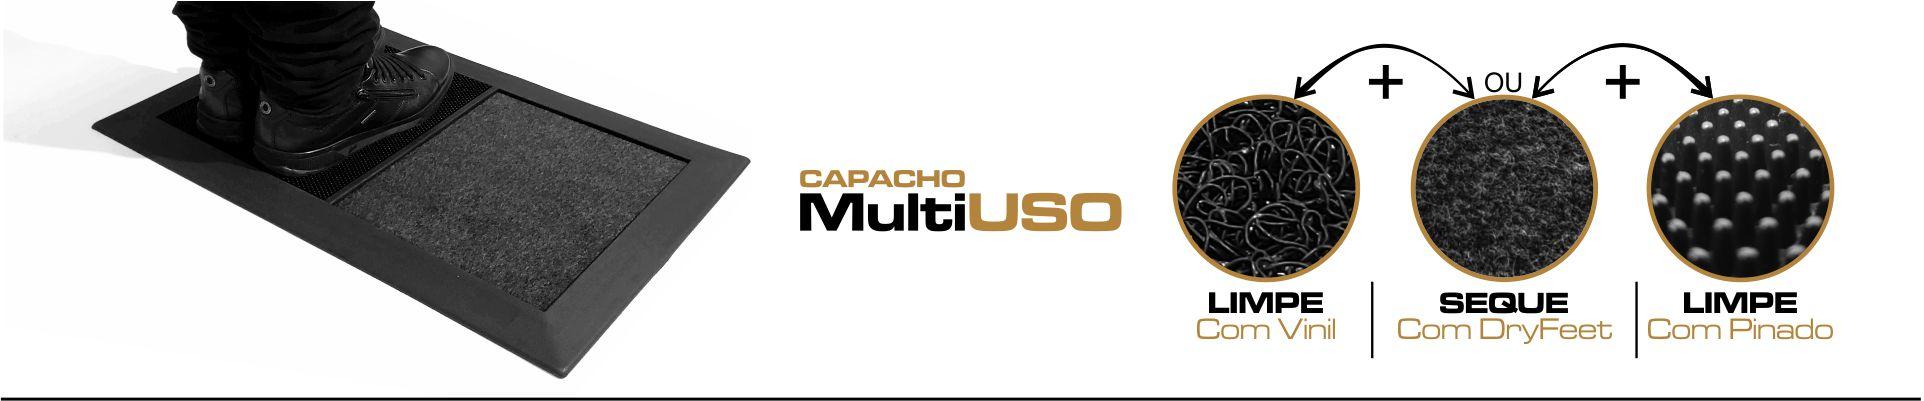 Capacho MultiUSO